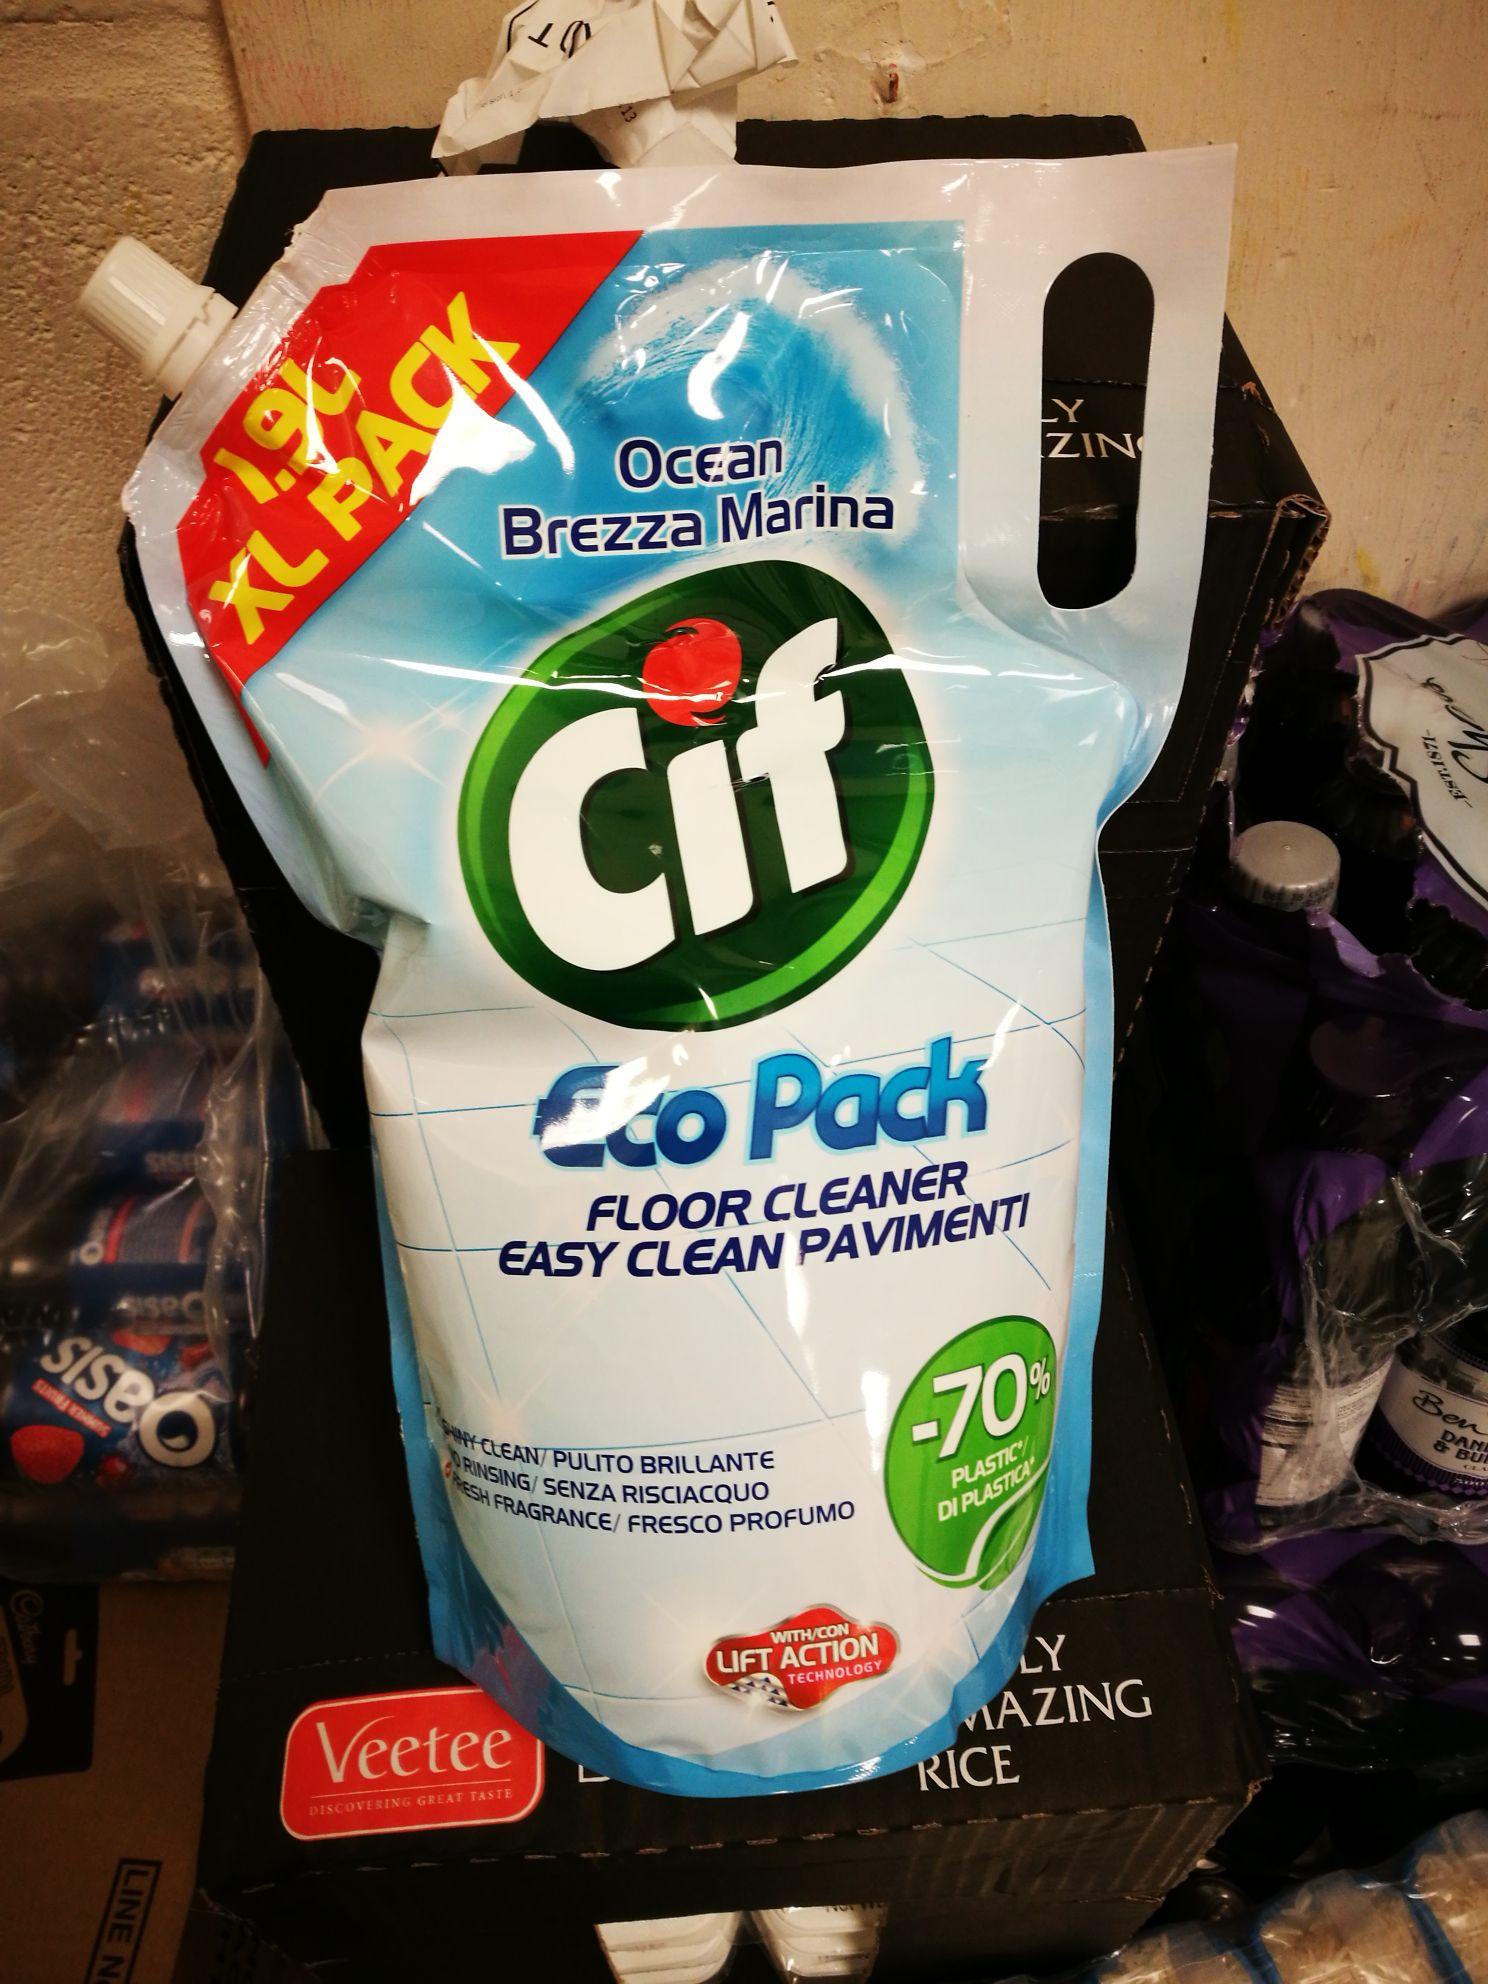 Cif floor cleaner £1.69 instore @ heron foods